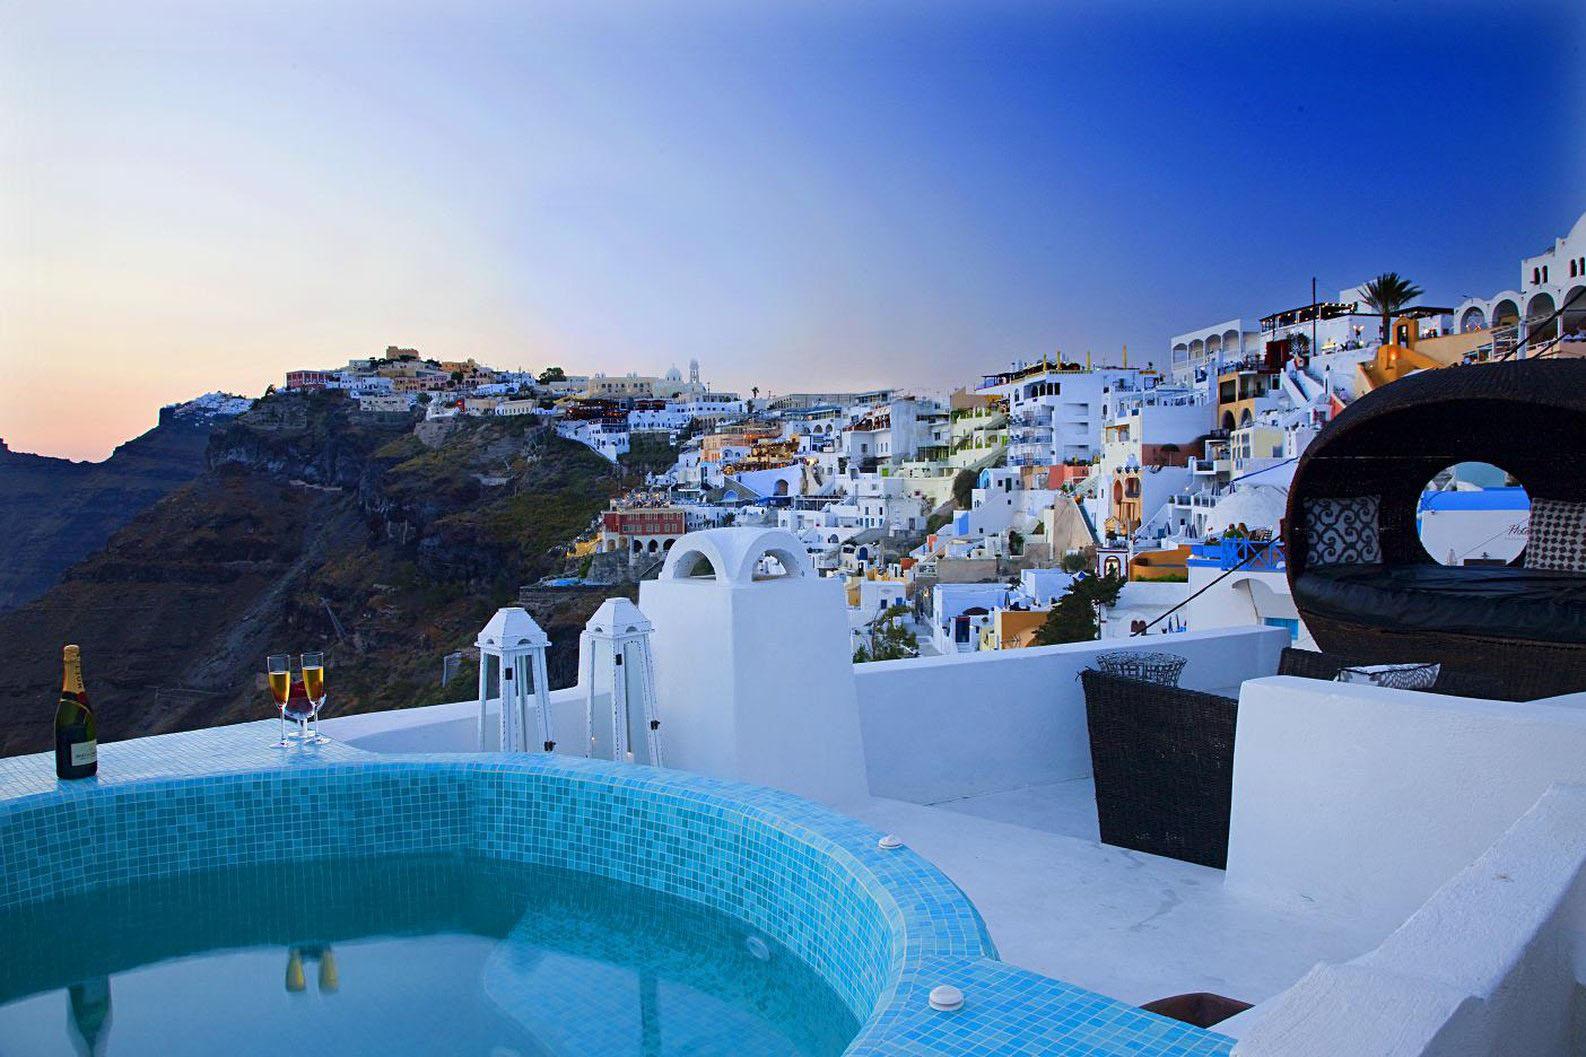 10 Amazing Vacation Rentals - KAYAK Travel Hacker - Blog - photo#29